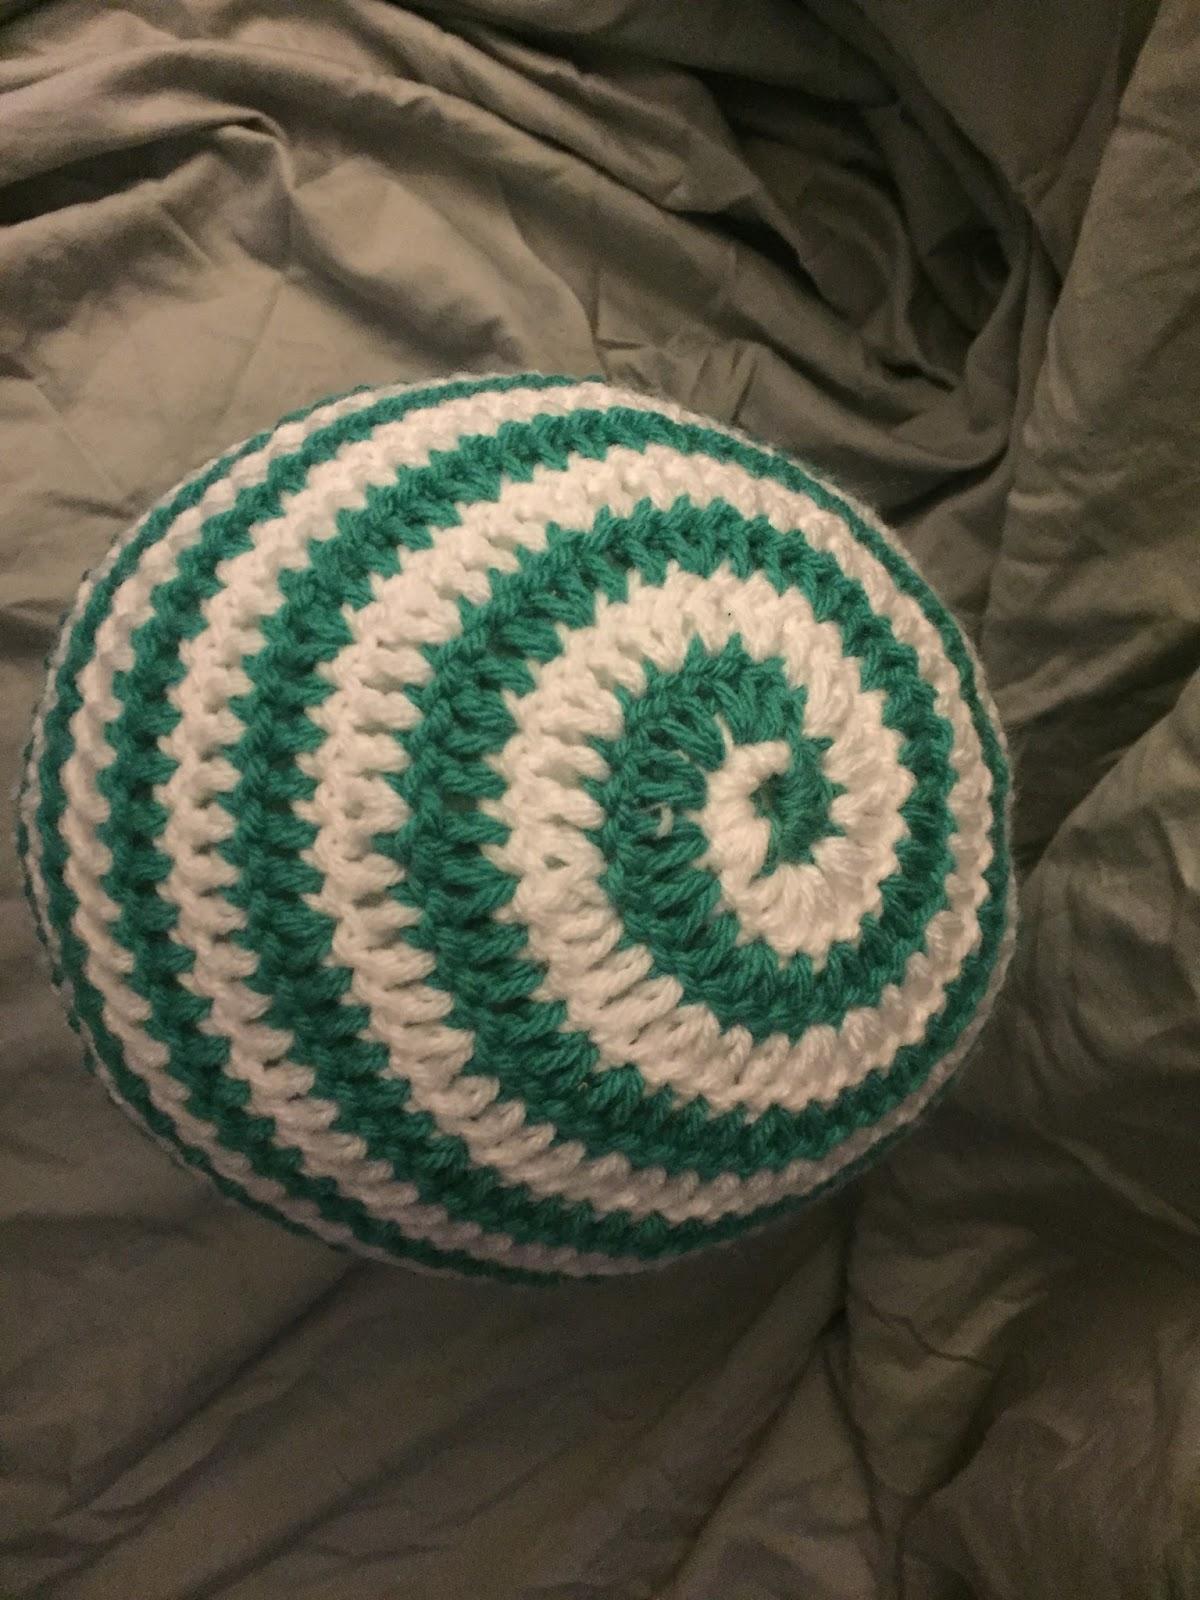 PinkOlay Crochet: 12/08/15